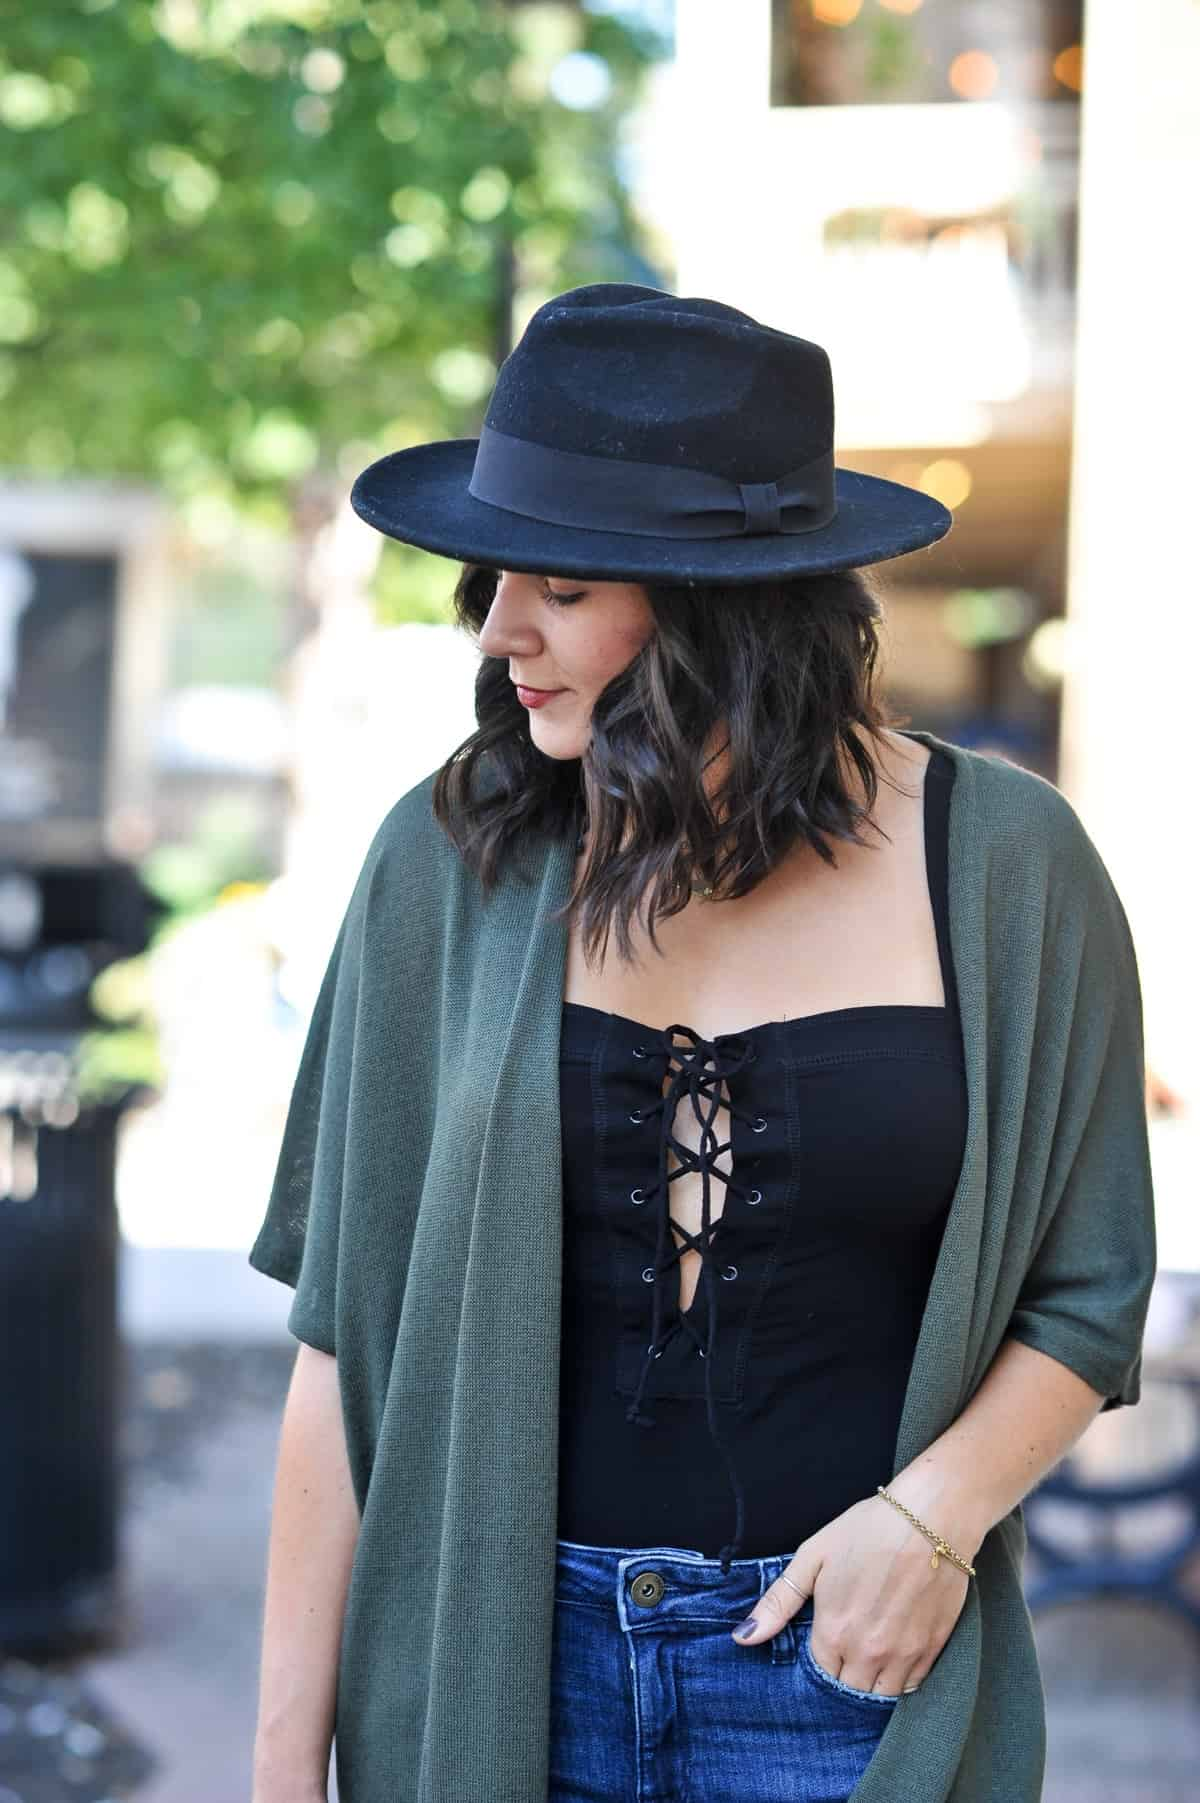 fall outfit ideas, oversized cardigan outfit - Style Vita @mystylevita